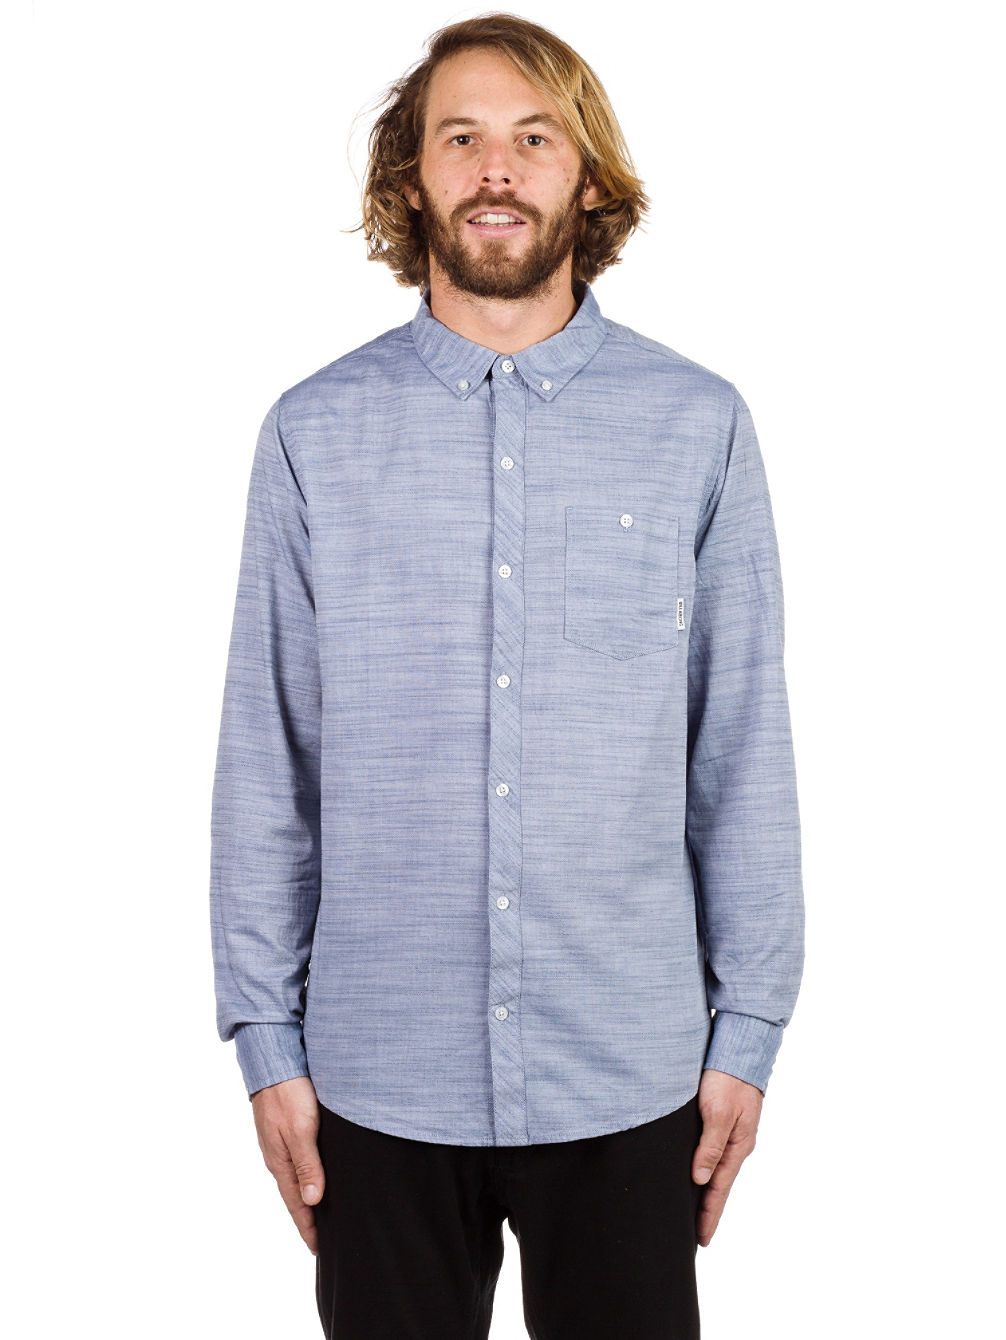 9dd8357a68a2 Buy Billabong All Day Slub Shirt LS online at Blue Tomato